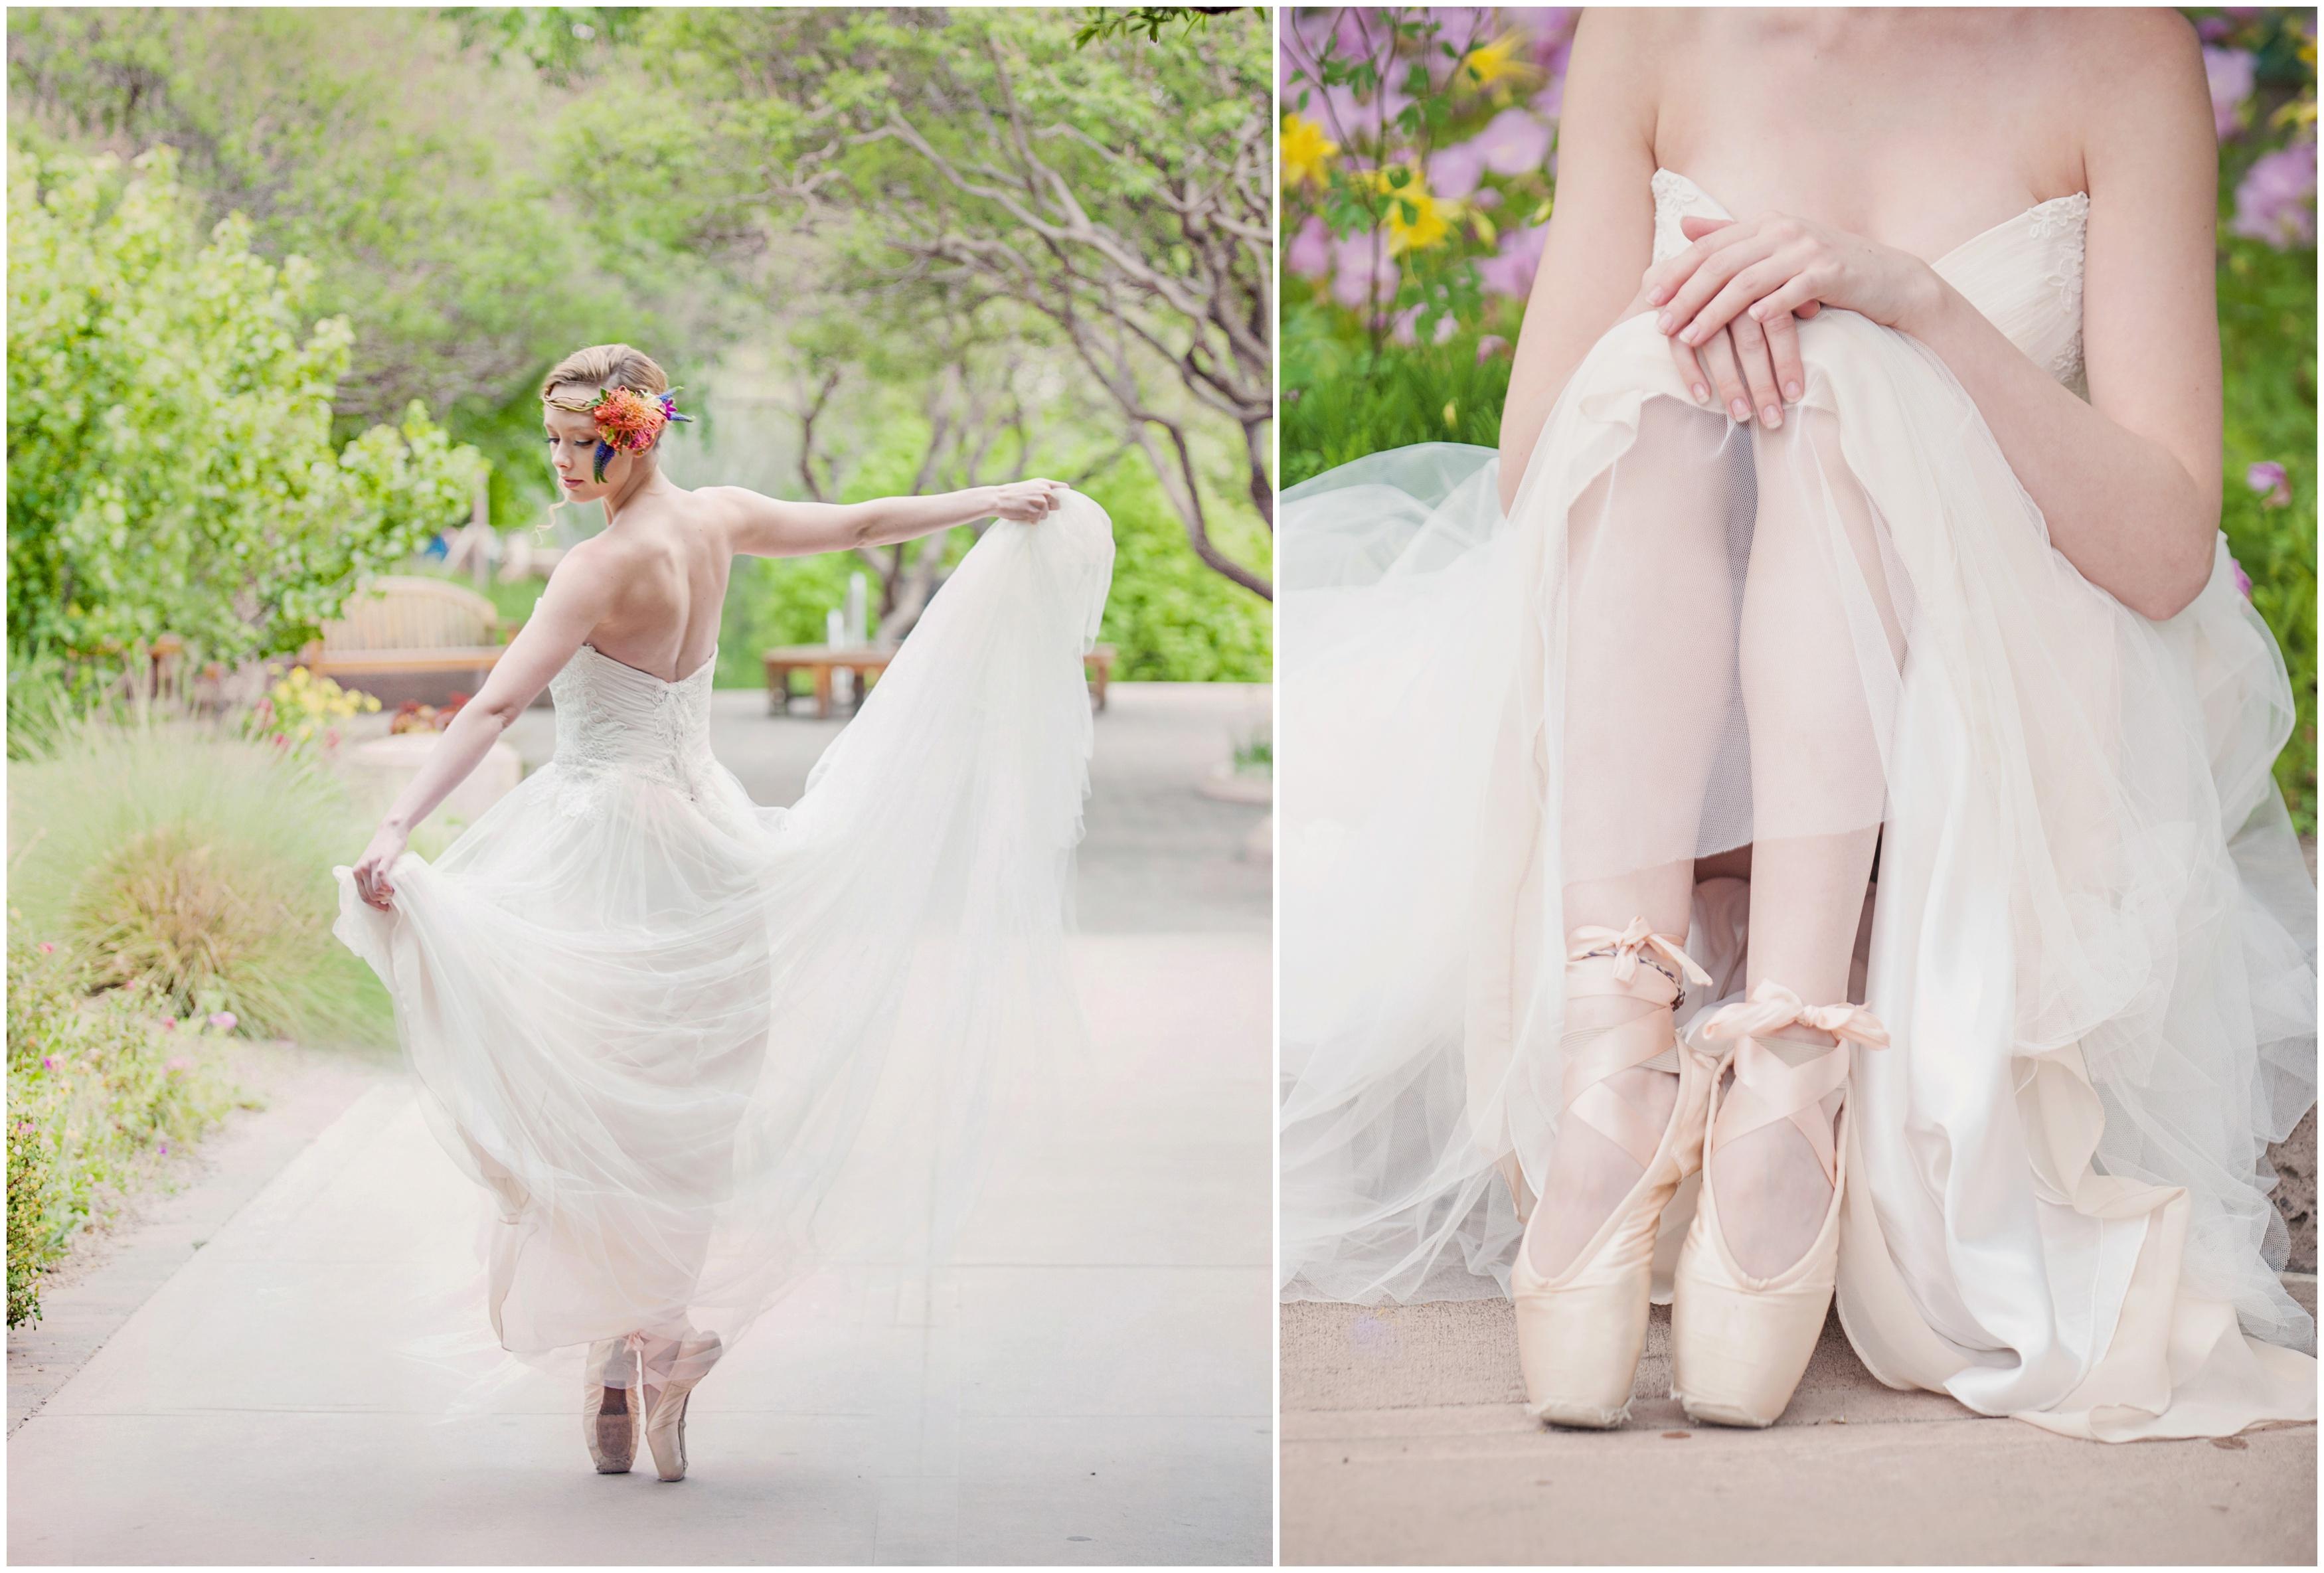 ballerina_brides_botanical_gardens_0010.jpg